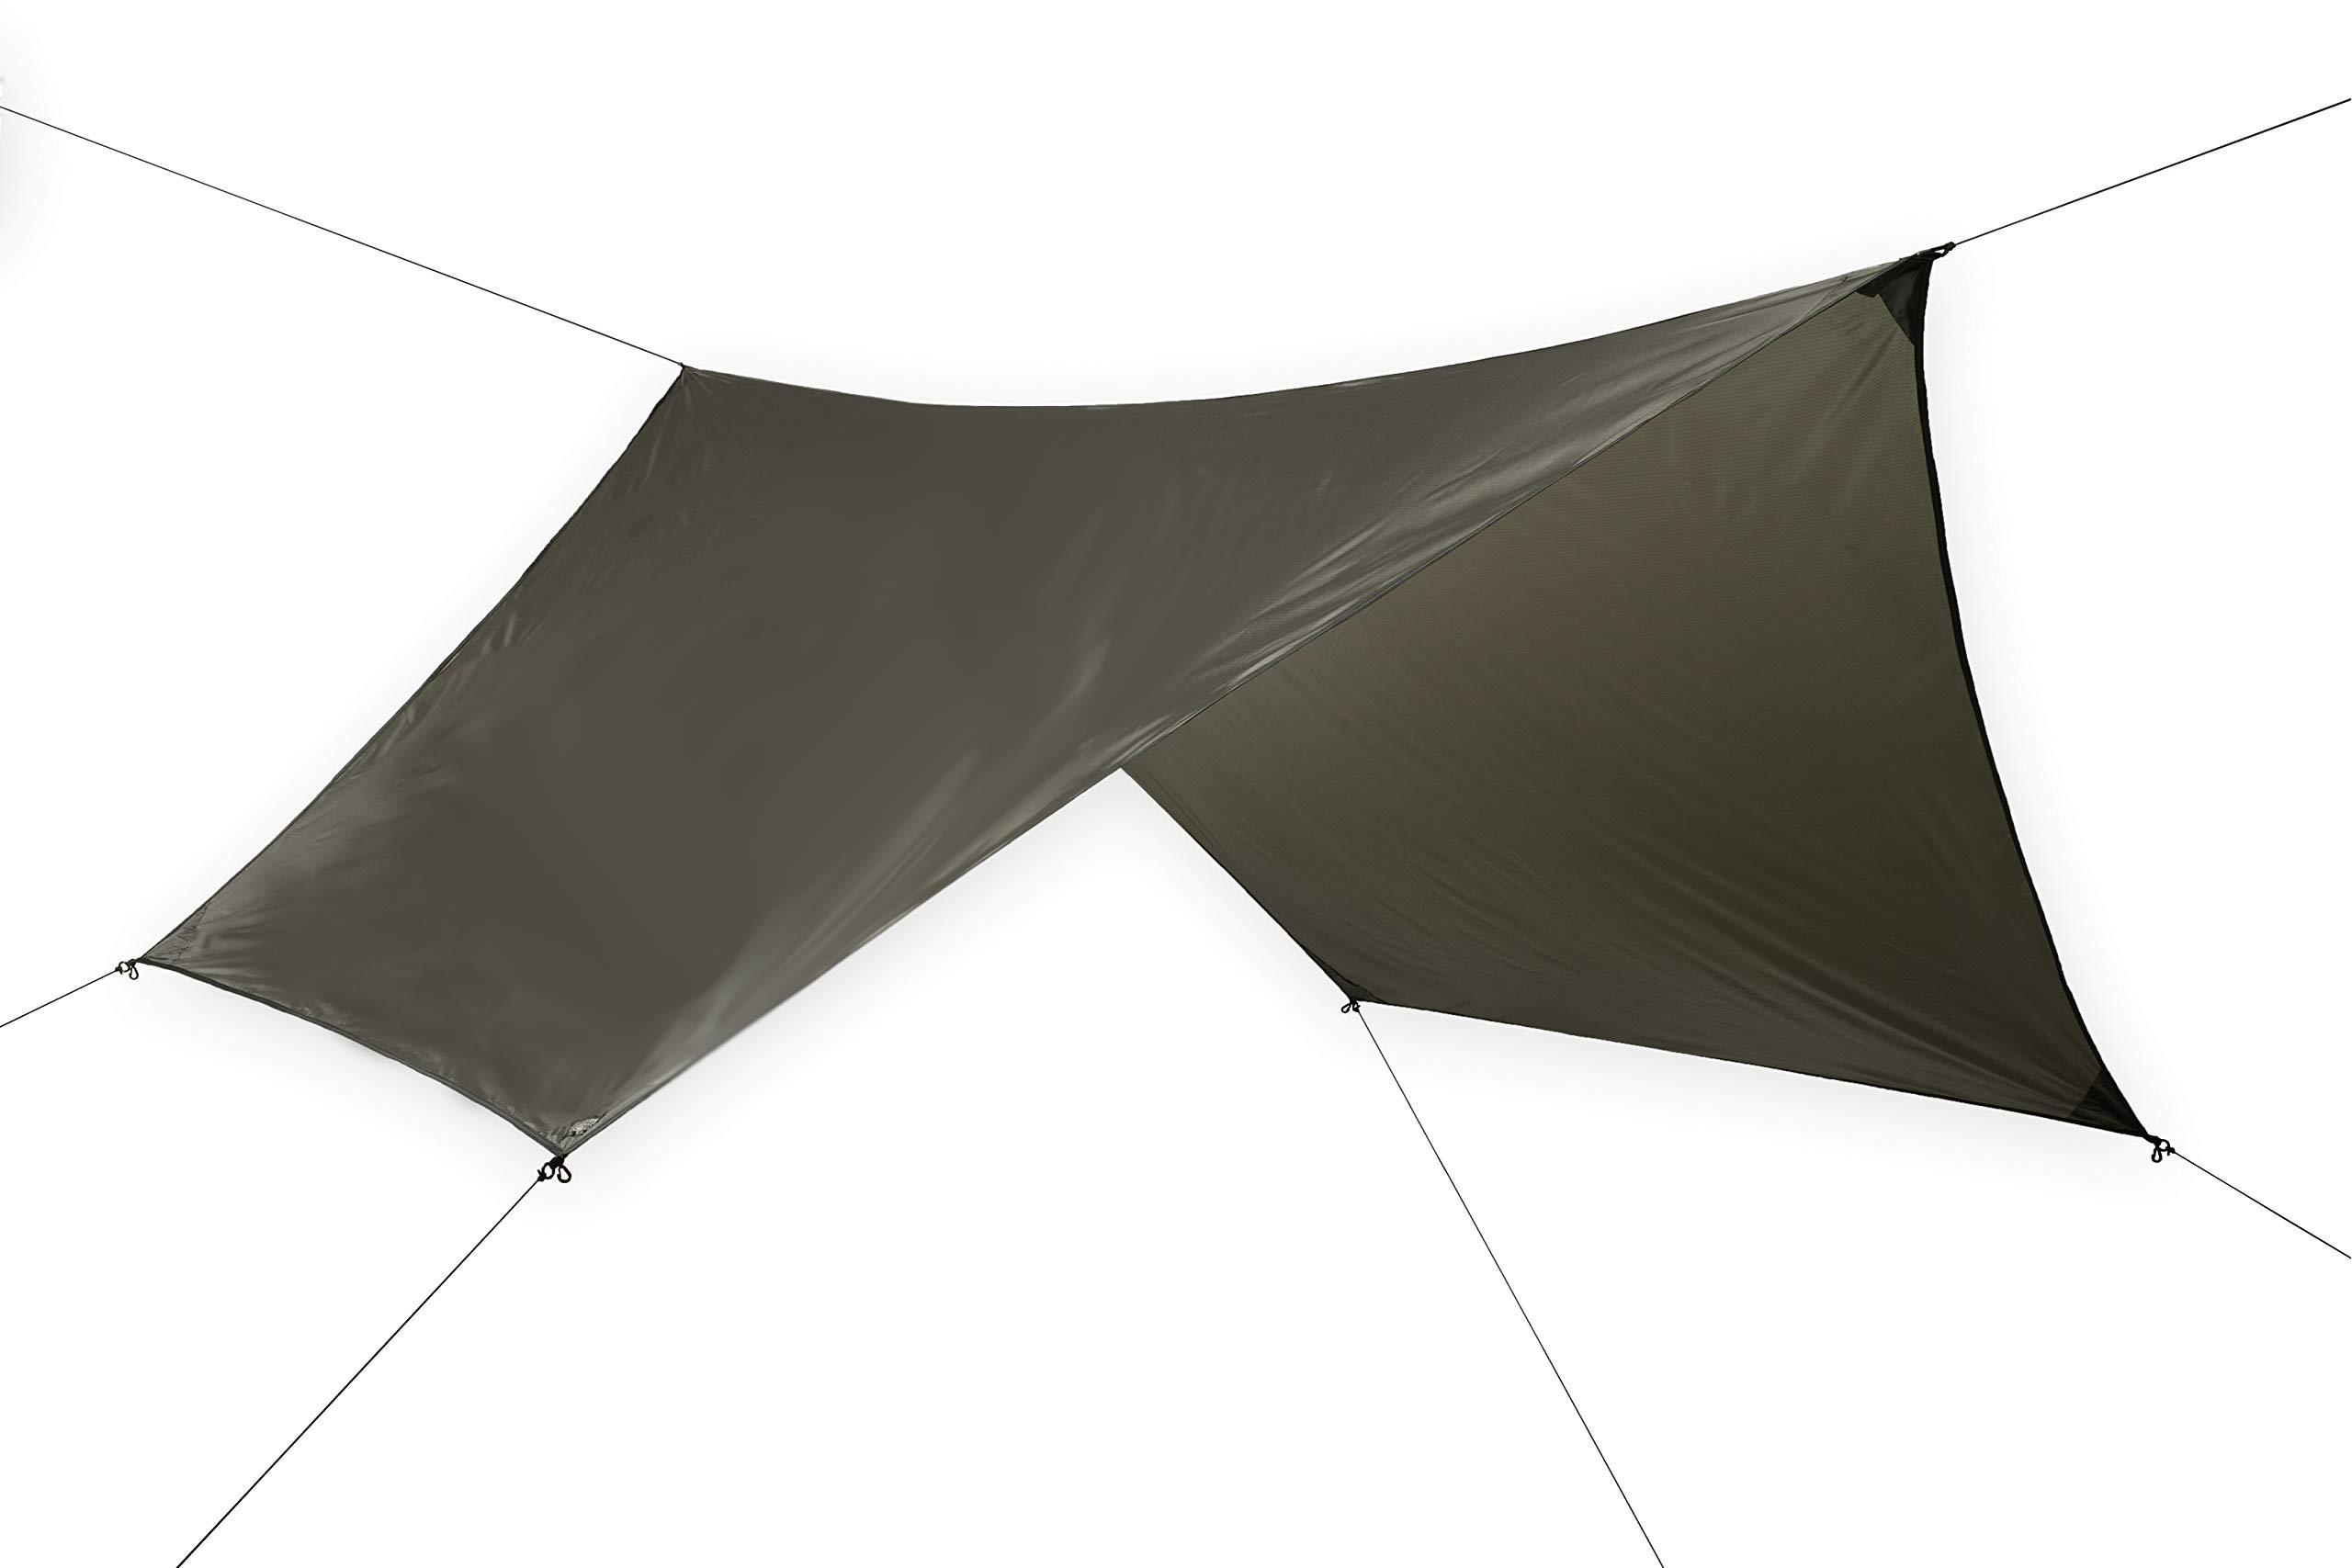 FREE SOLDIER Camping Tarp Waterproof 3m x 3.3m Large Hammock Tent Tarp Portable Tarpaulin Anti-UV Shelter Sun Block Sunshade Awning for Camping Hiking Traveling Outdoor Sports